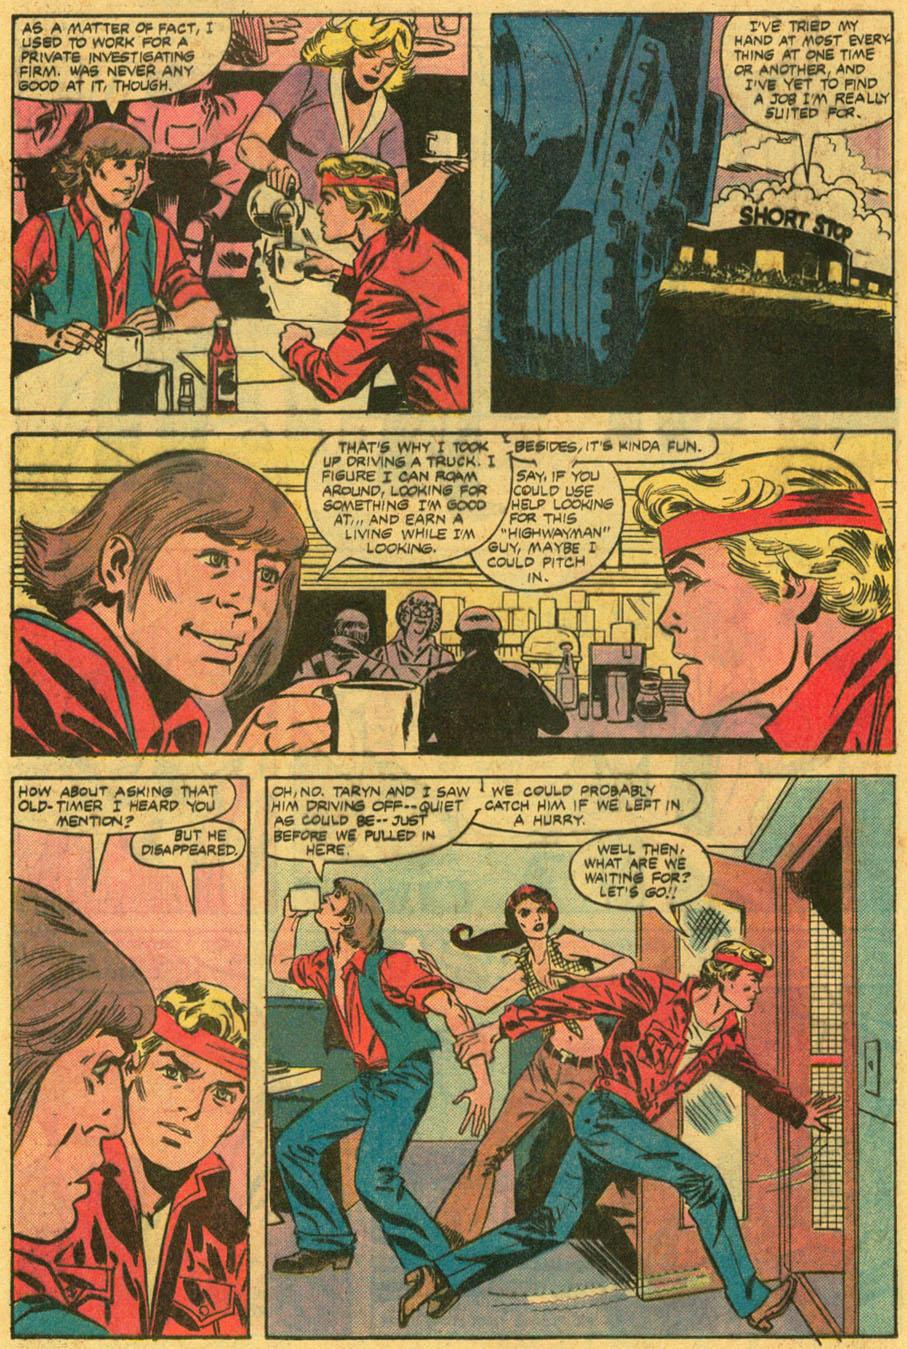 Read online U.S. 1 comic -  Issue #3 - 10